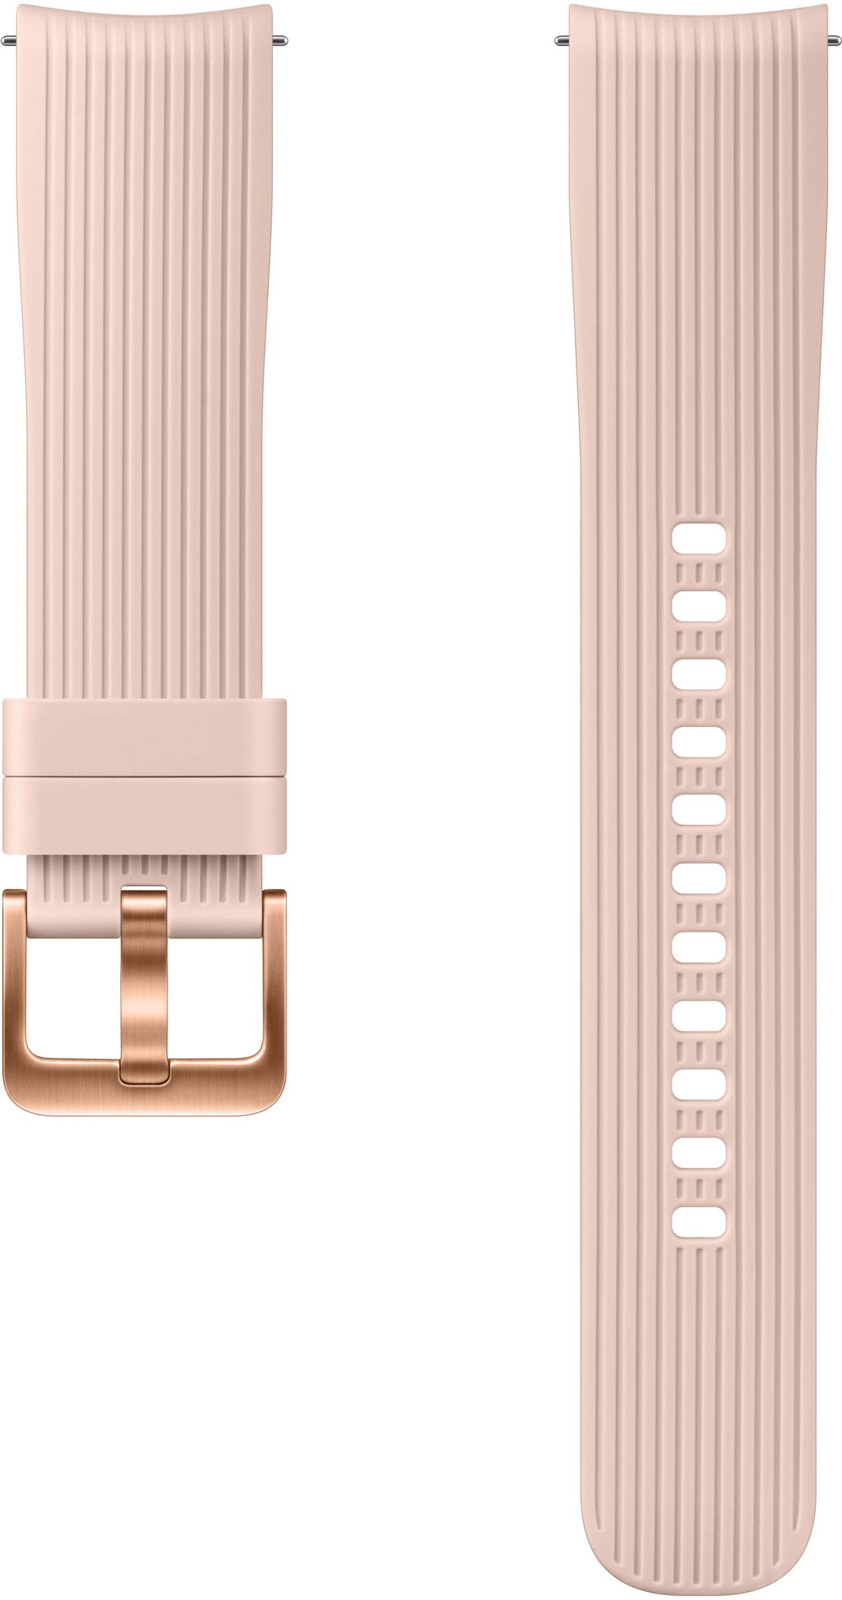 Ремешок для смарт-часов Samsung для Galaxy Watch 42мм/Gear Sport, розовый ремешок samsung для samsung galaxy watch 46мм samsung gear sport серый